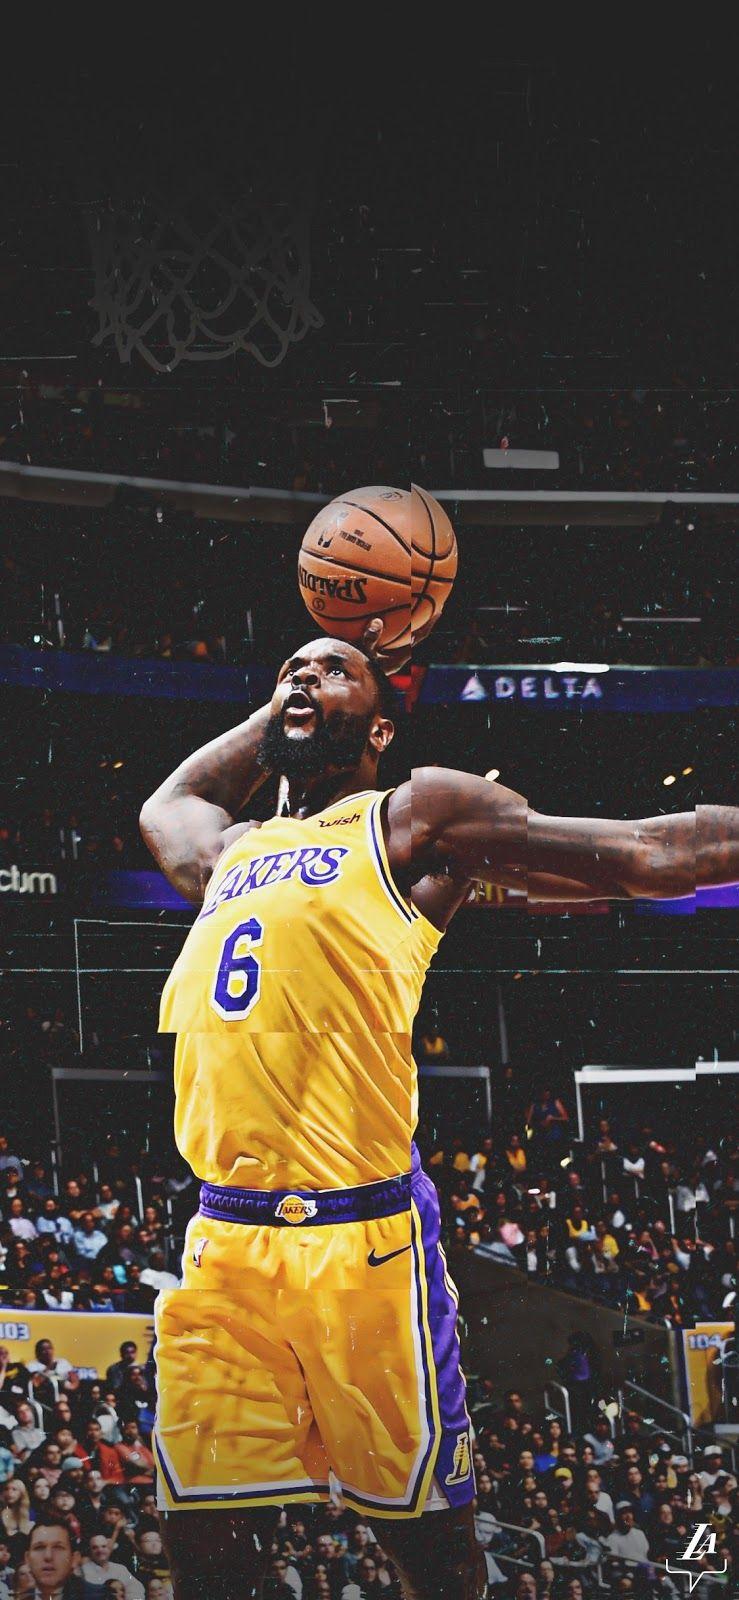 Nike Iphone Wallpapers Hd Kobe Bryant Wallpaper Iphone Wallpaper Nba Kobe Bryant Kids